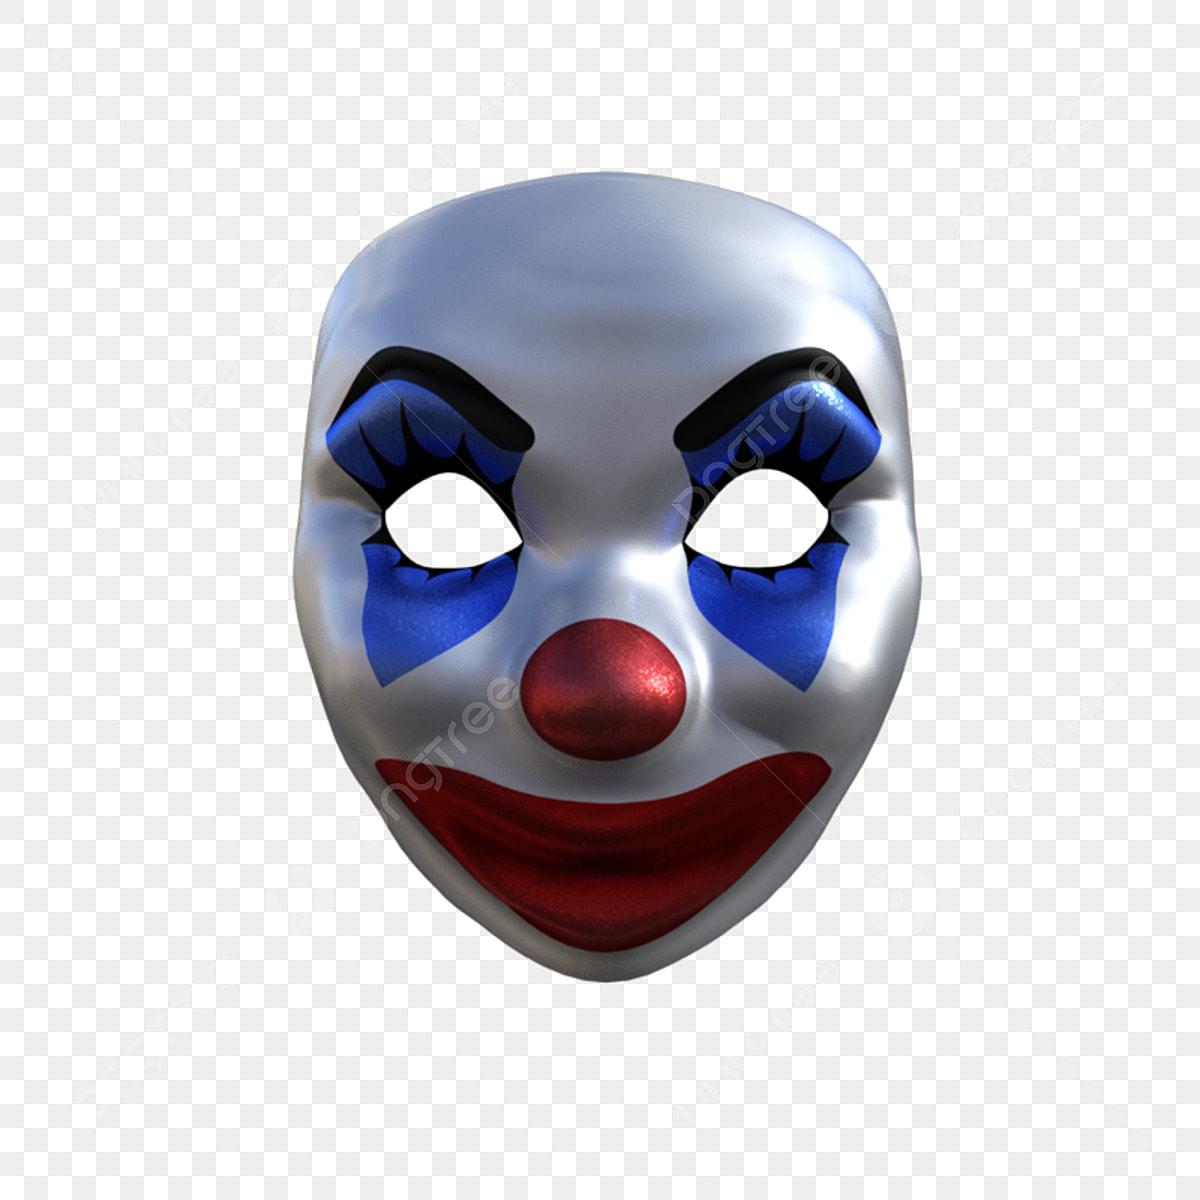 Pubg Joker Mask | Pubg Rp Season 4 Hack